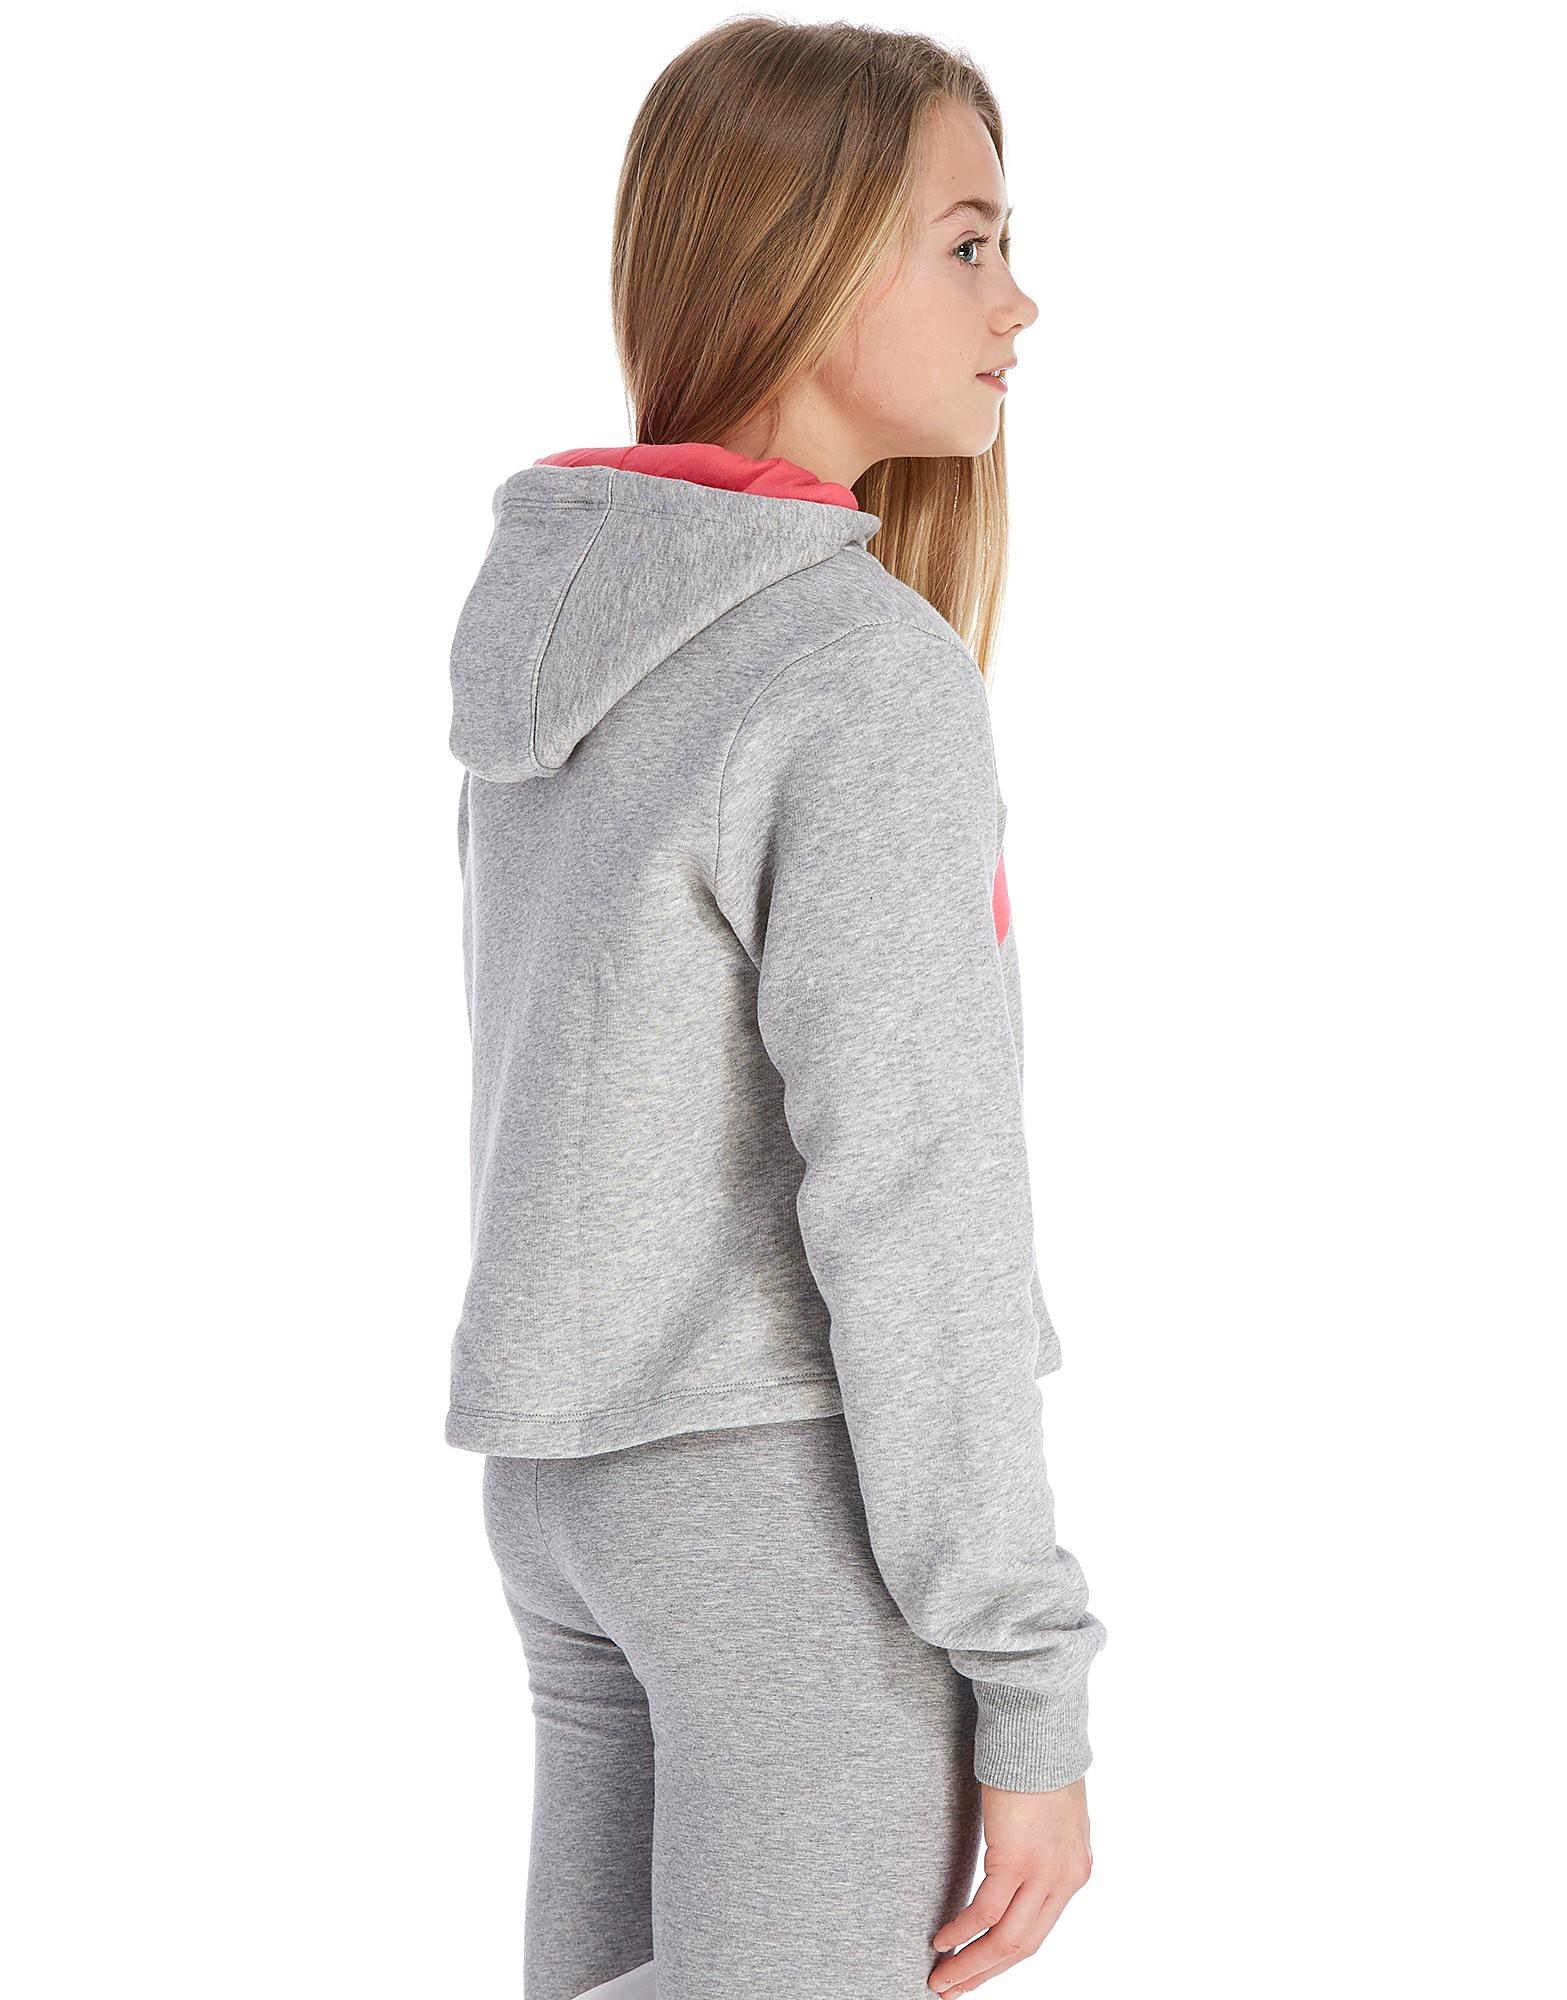 adidas Originals Girls' Crop Hoodie Junior